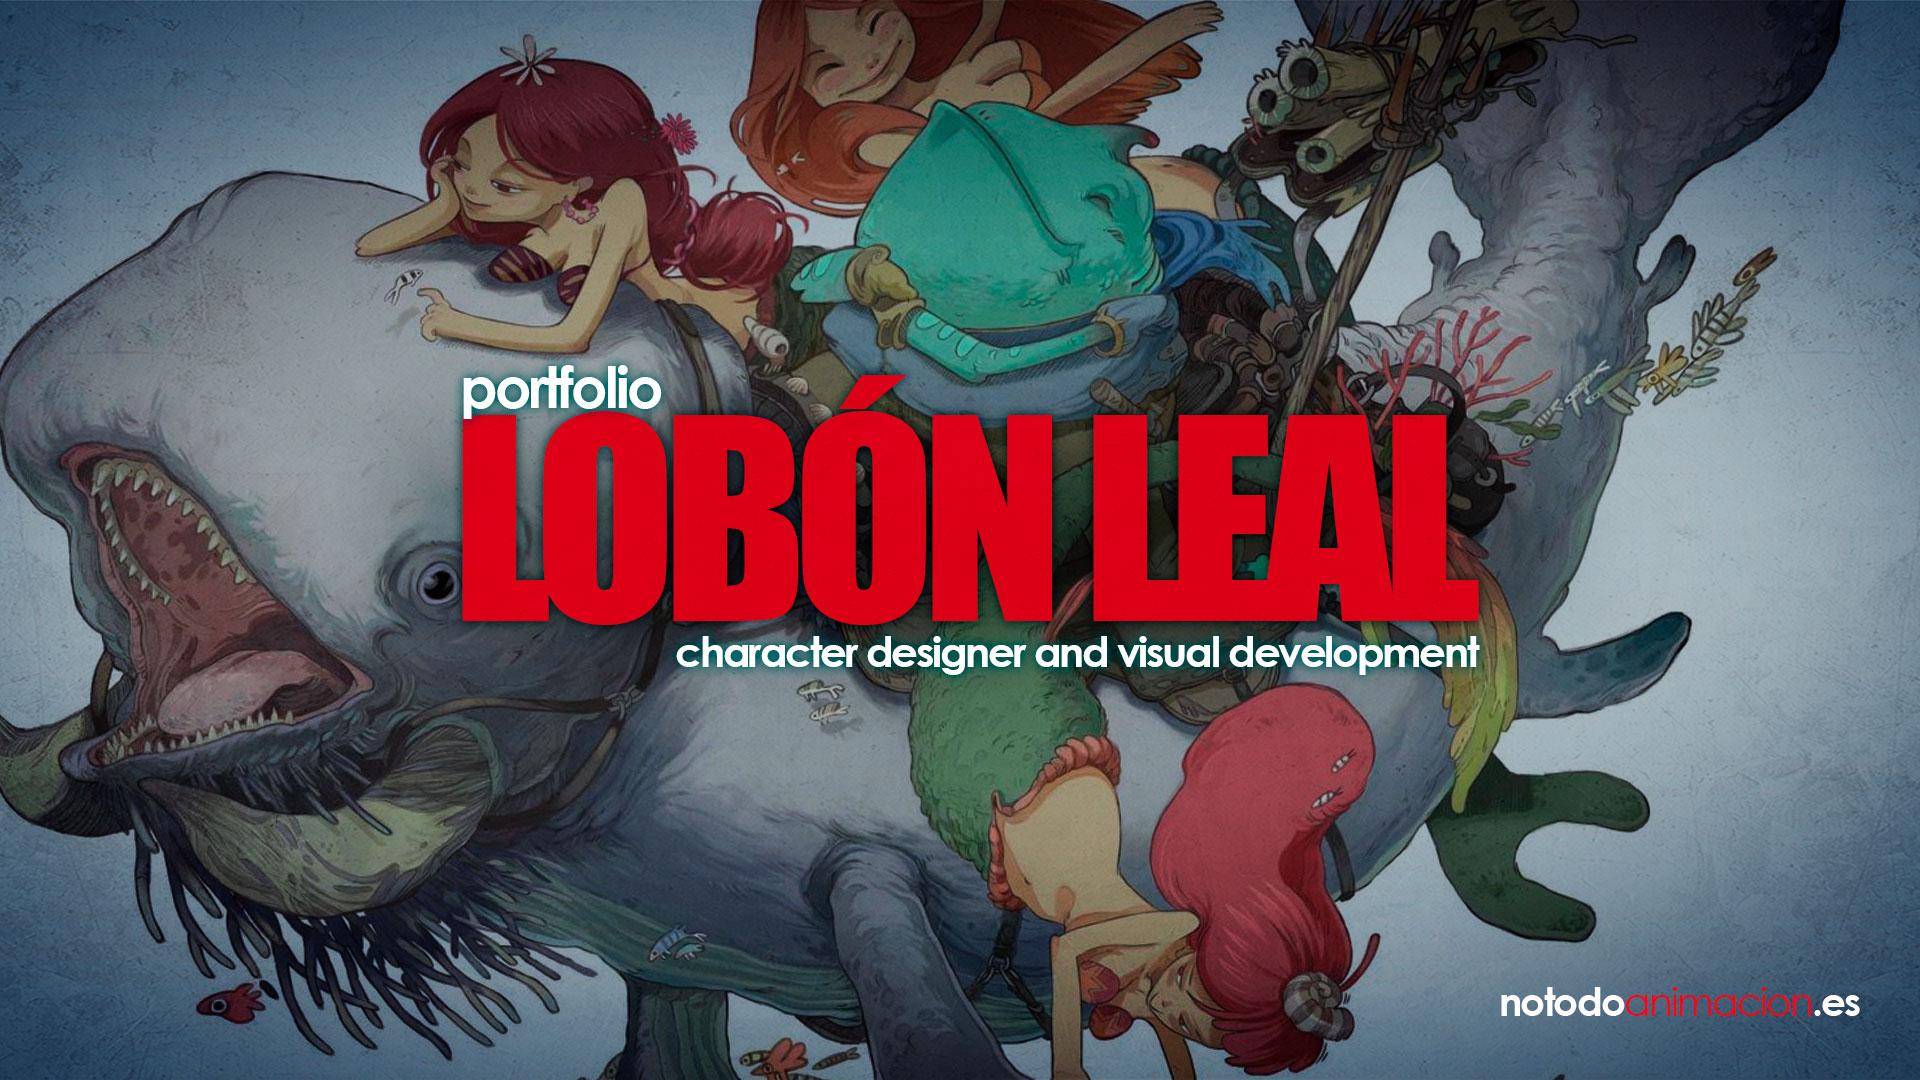 portfolio de diseño de personajes